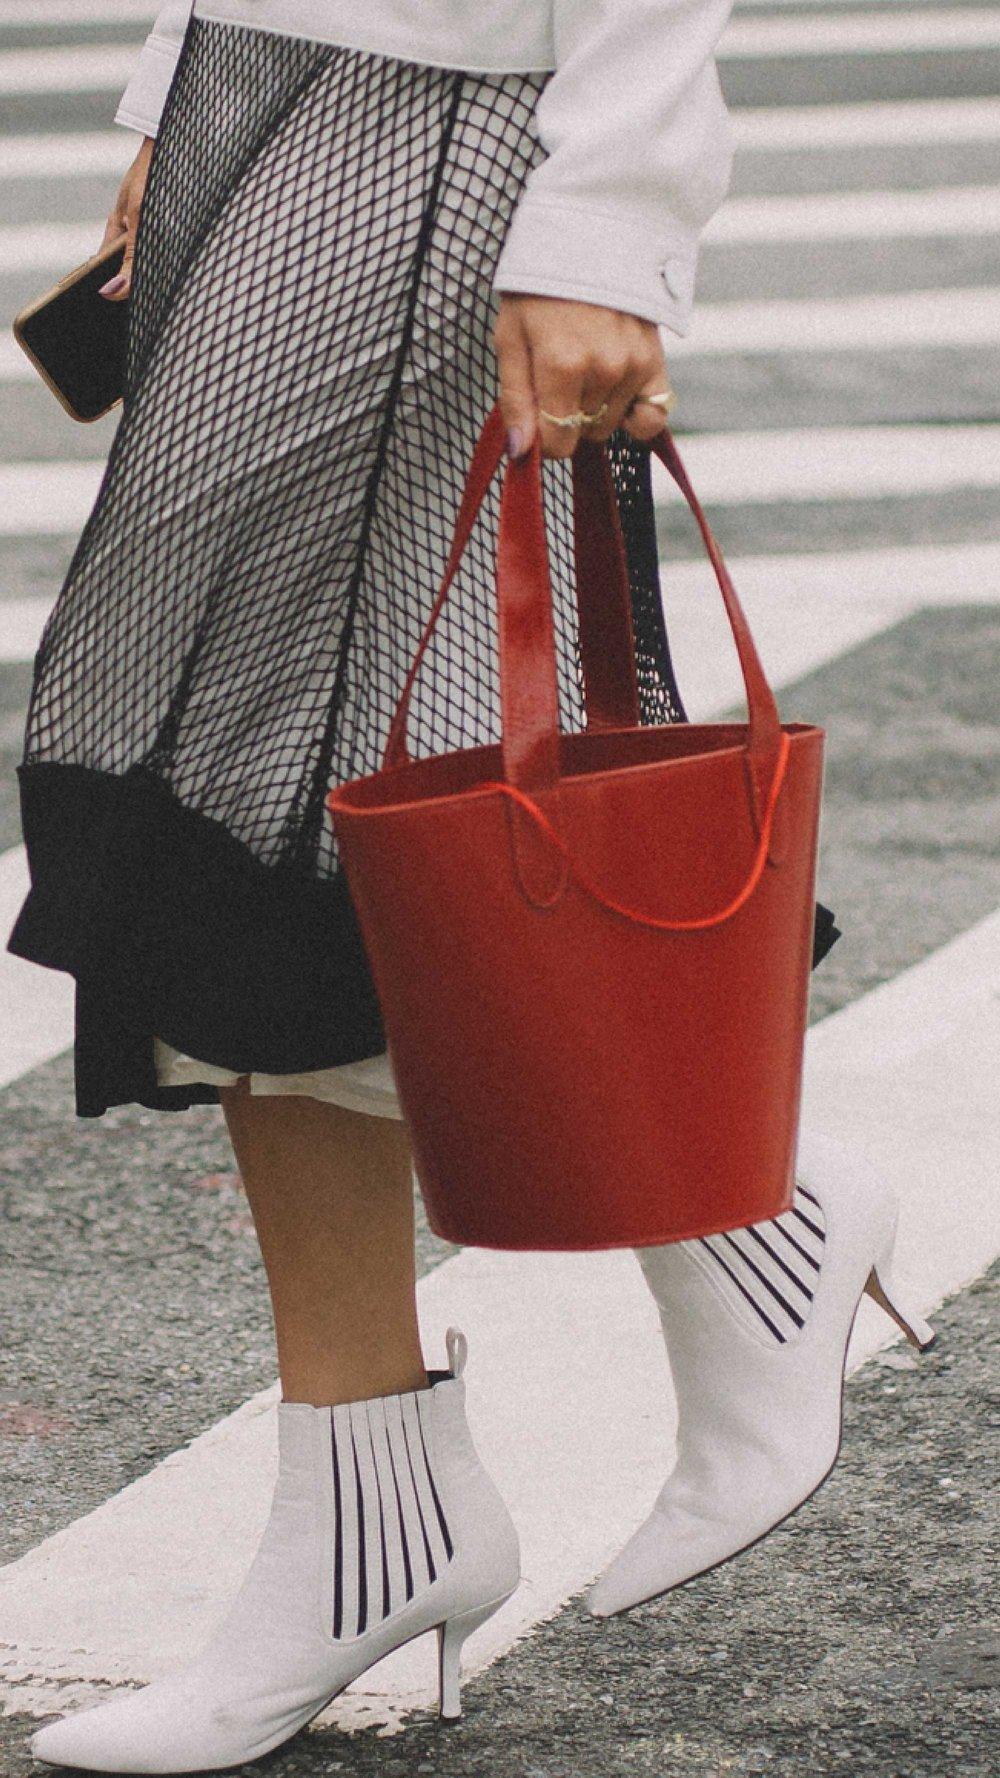 New-York-Fashion-Week-NYFW-SS18-street-style-day-five-SS18-5.jpg